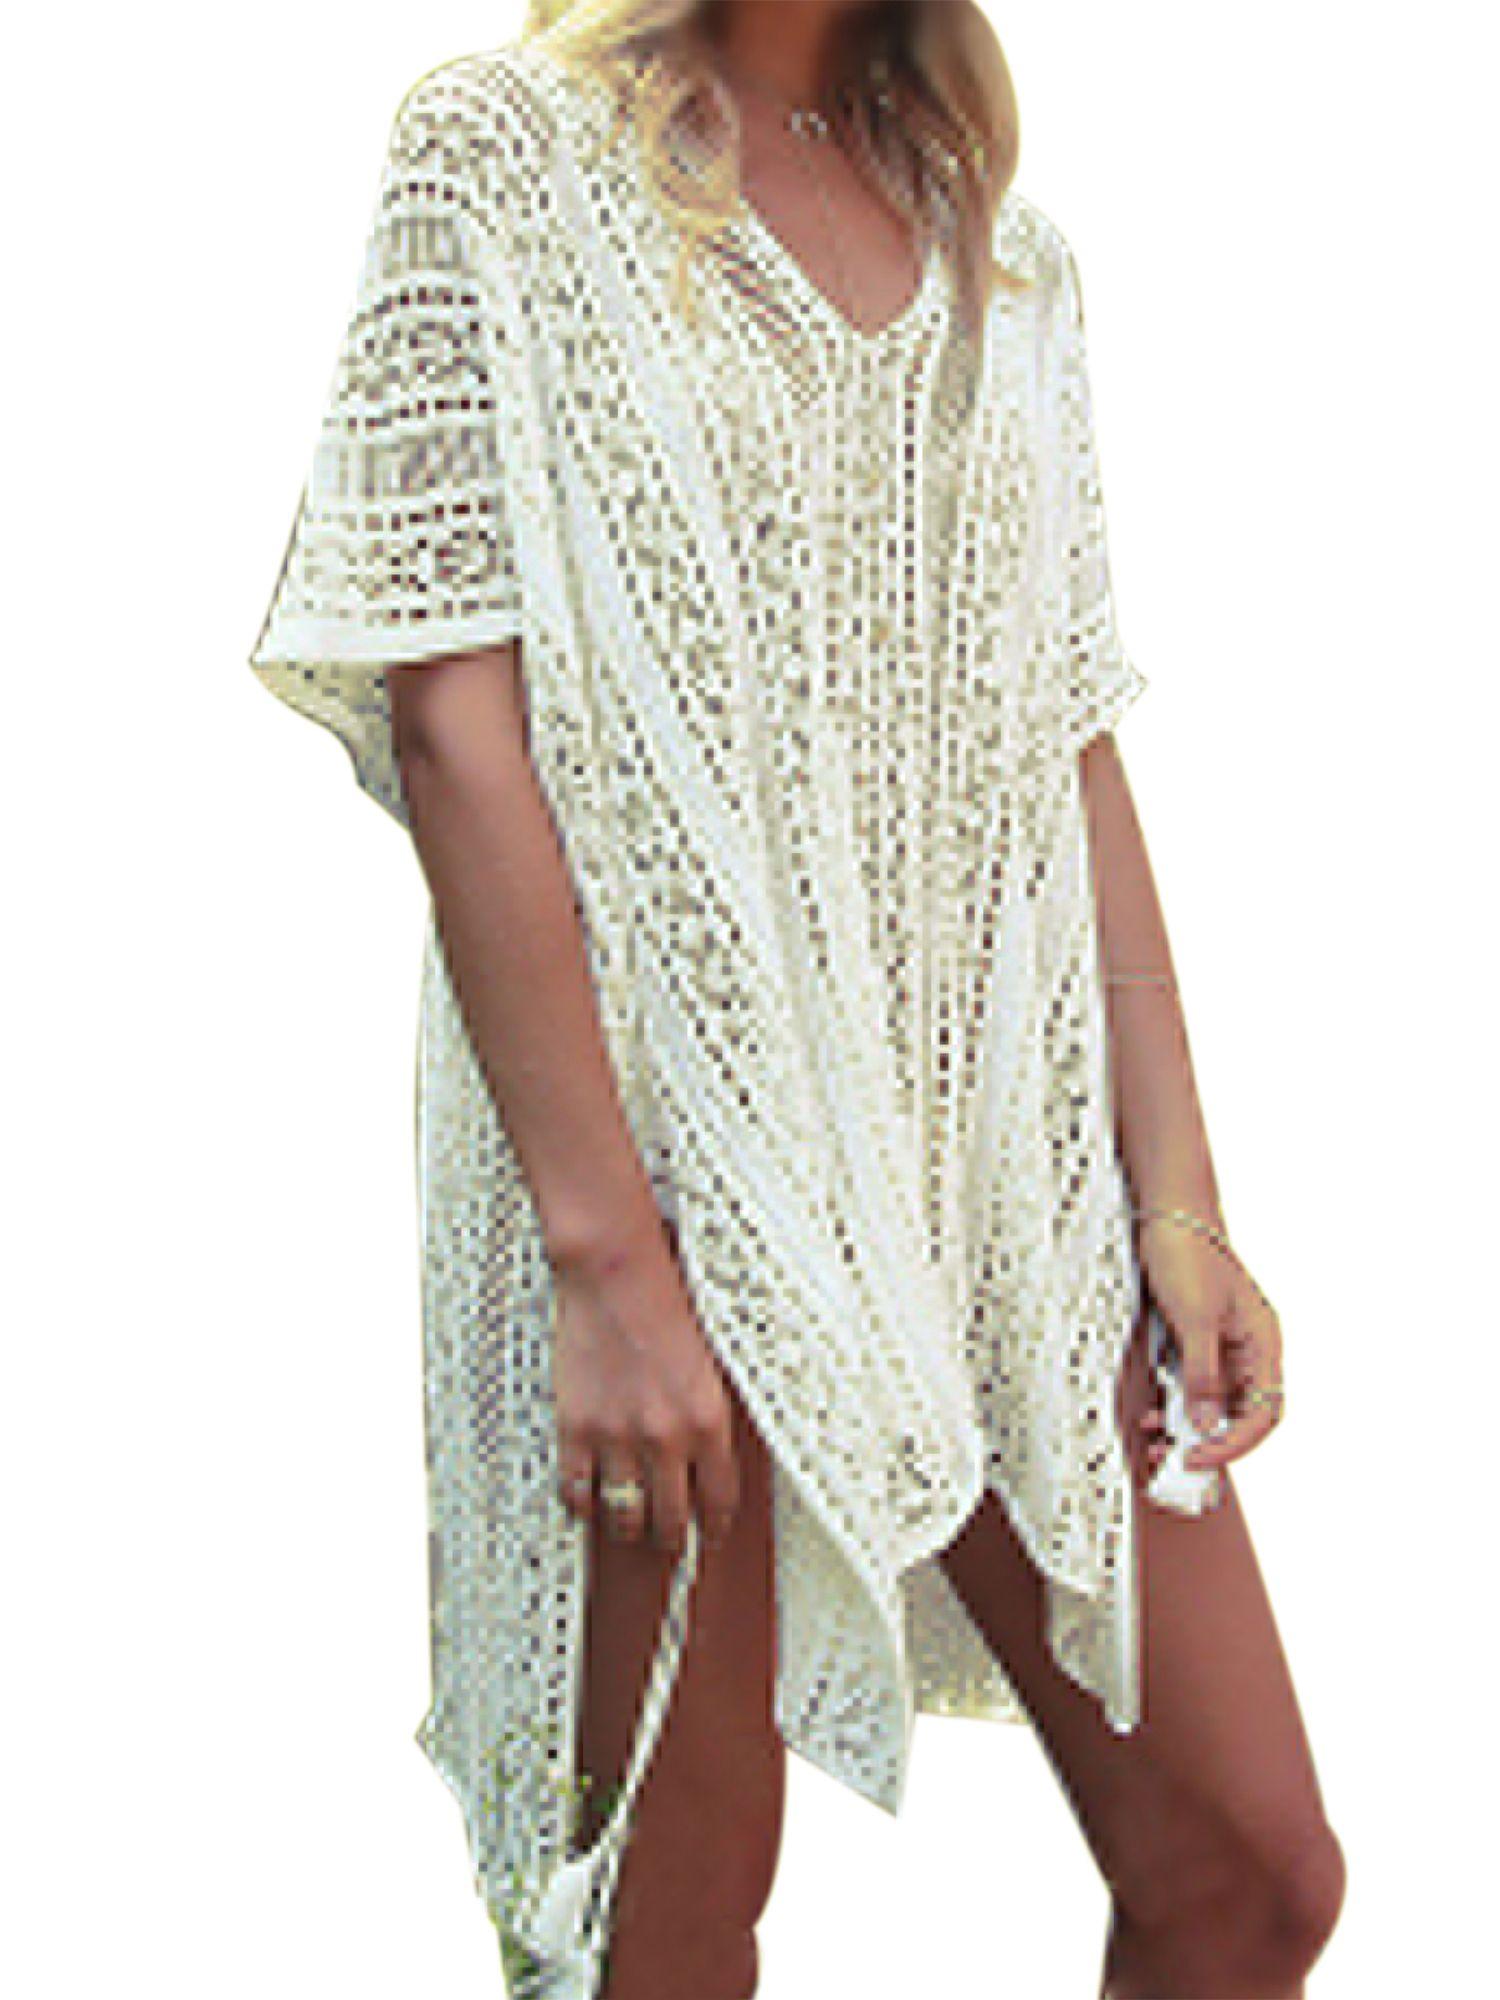 89a1a972a44ca Swim Cover ups Women Knit Lace Crochet Bikini Beachwear V-neck Hollow Out  Loose Beach Dress Tops Summer Bathing Suit Crochet